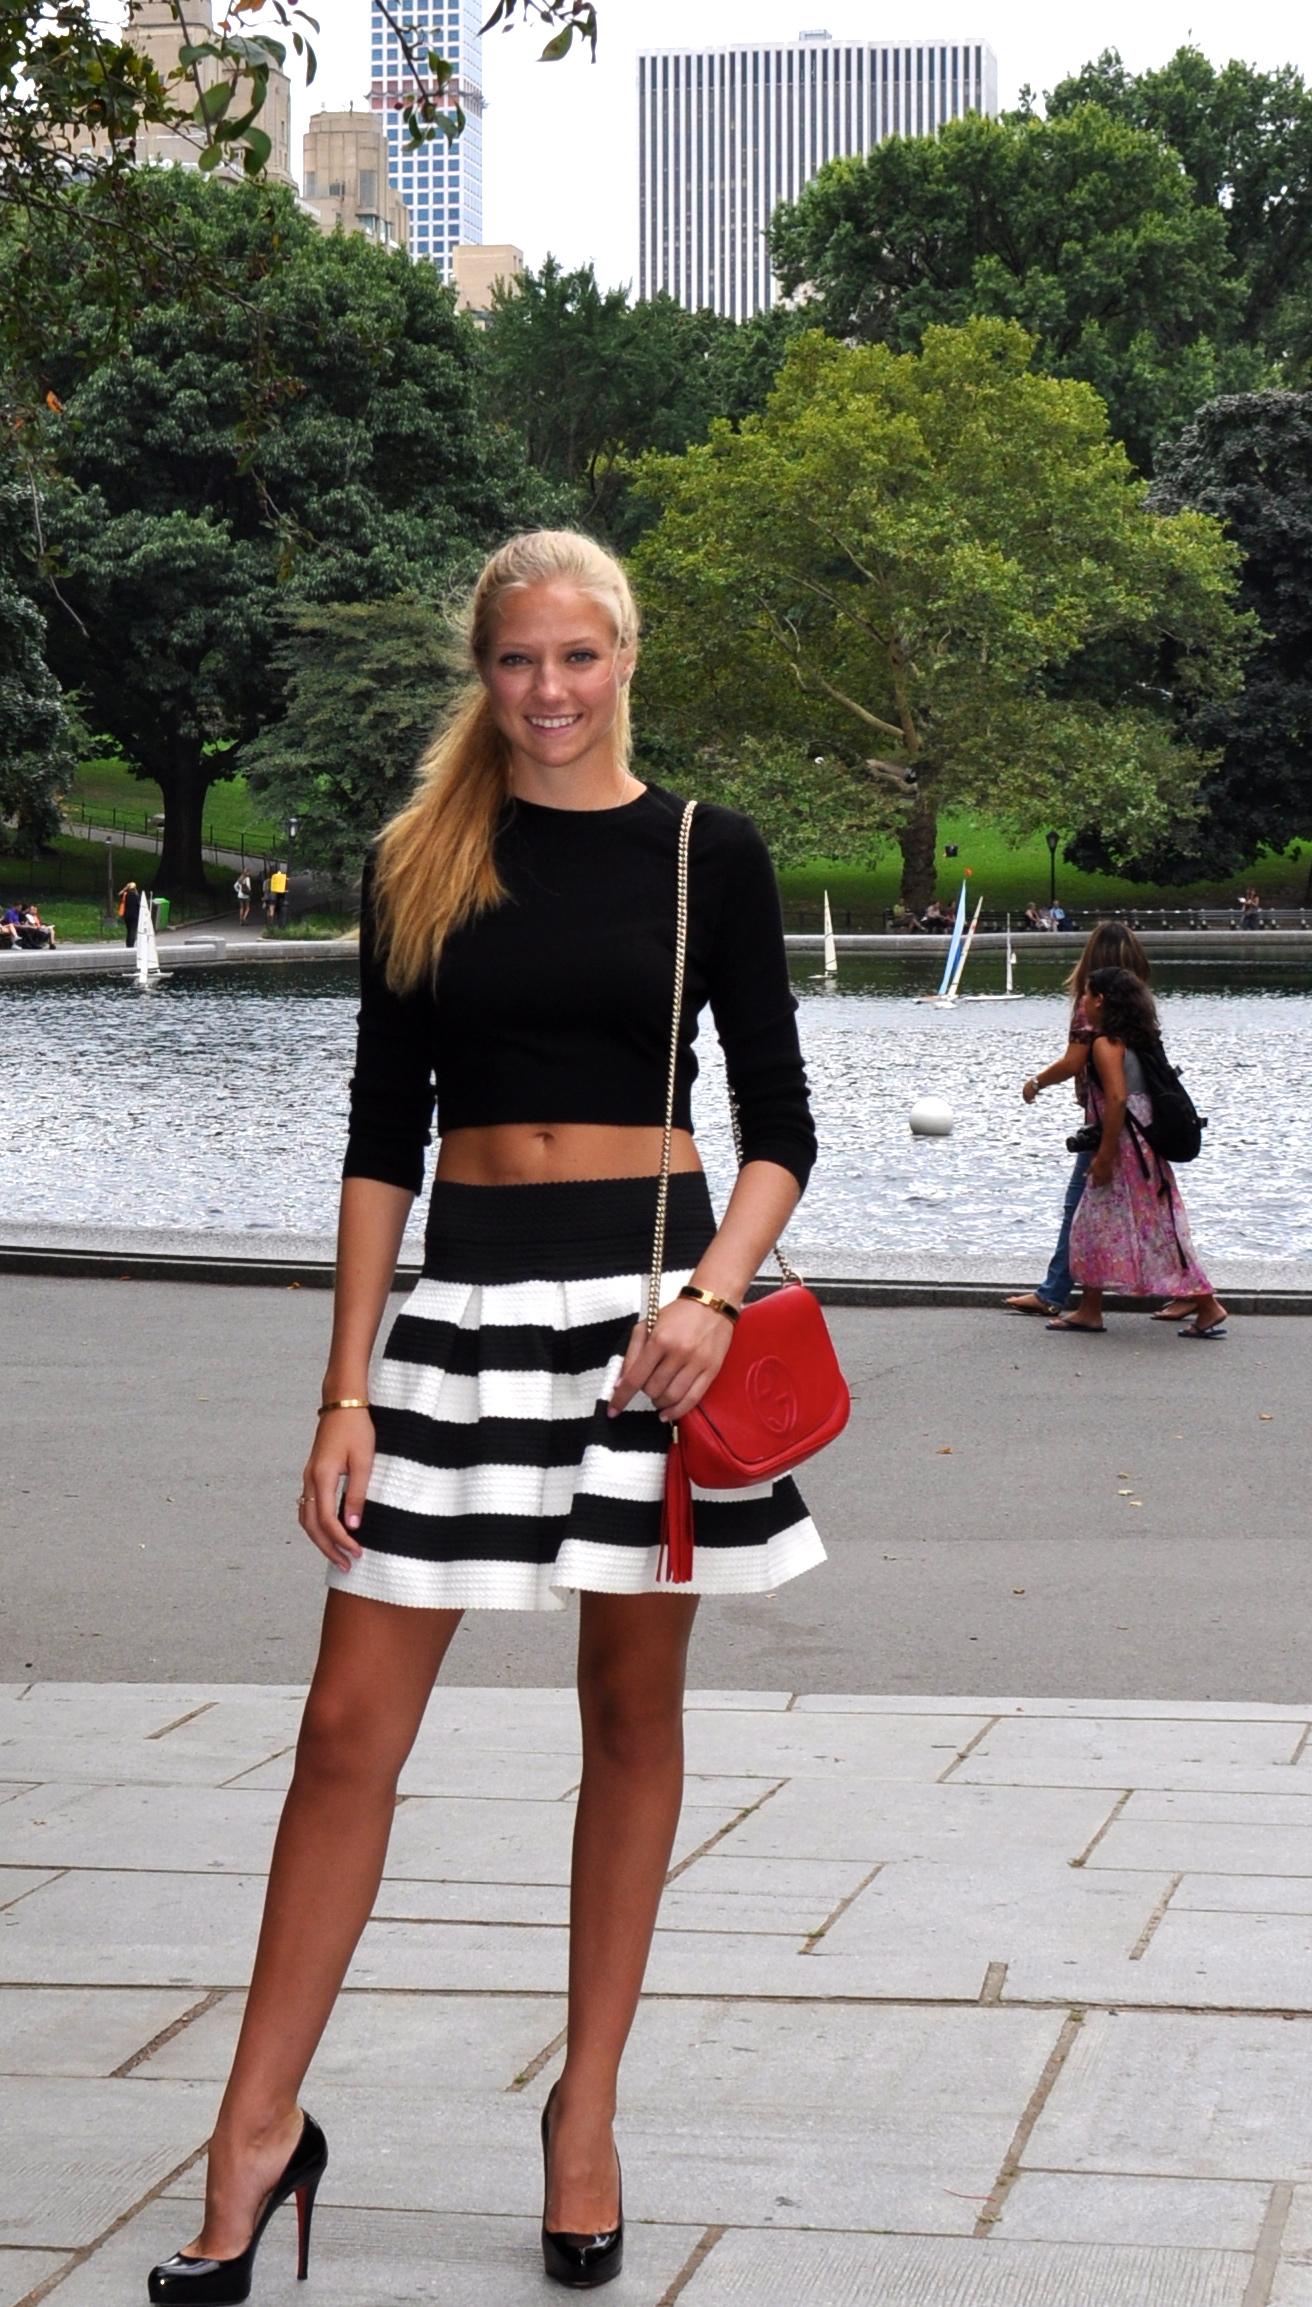 Top  American Apparel   Skirt  Aqua  Shoes  Christian Louboutin  Handbag   Gucci (Similar Here) b4c4b59c113